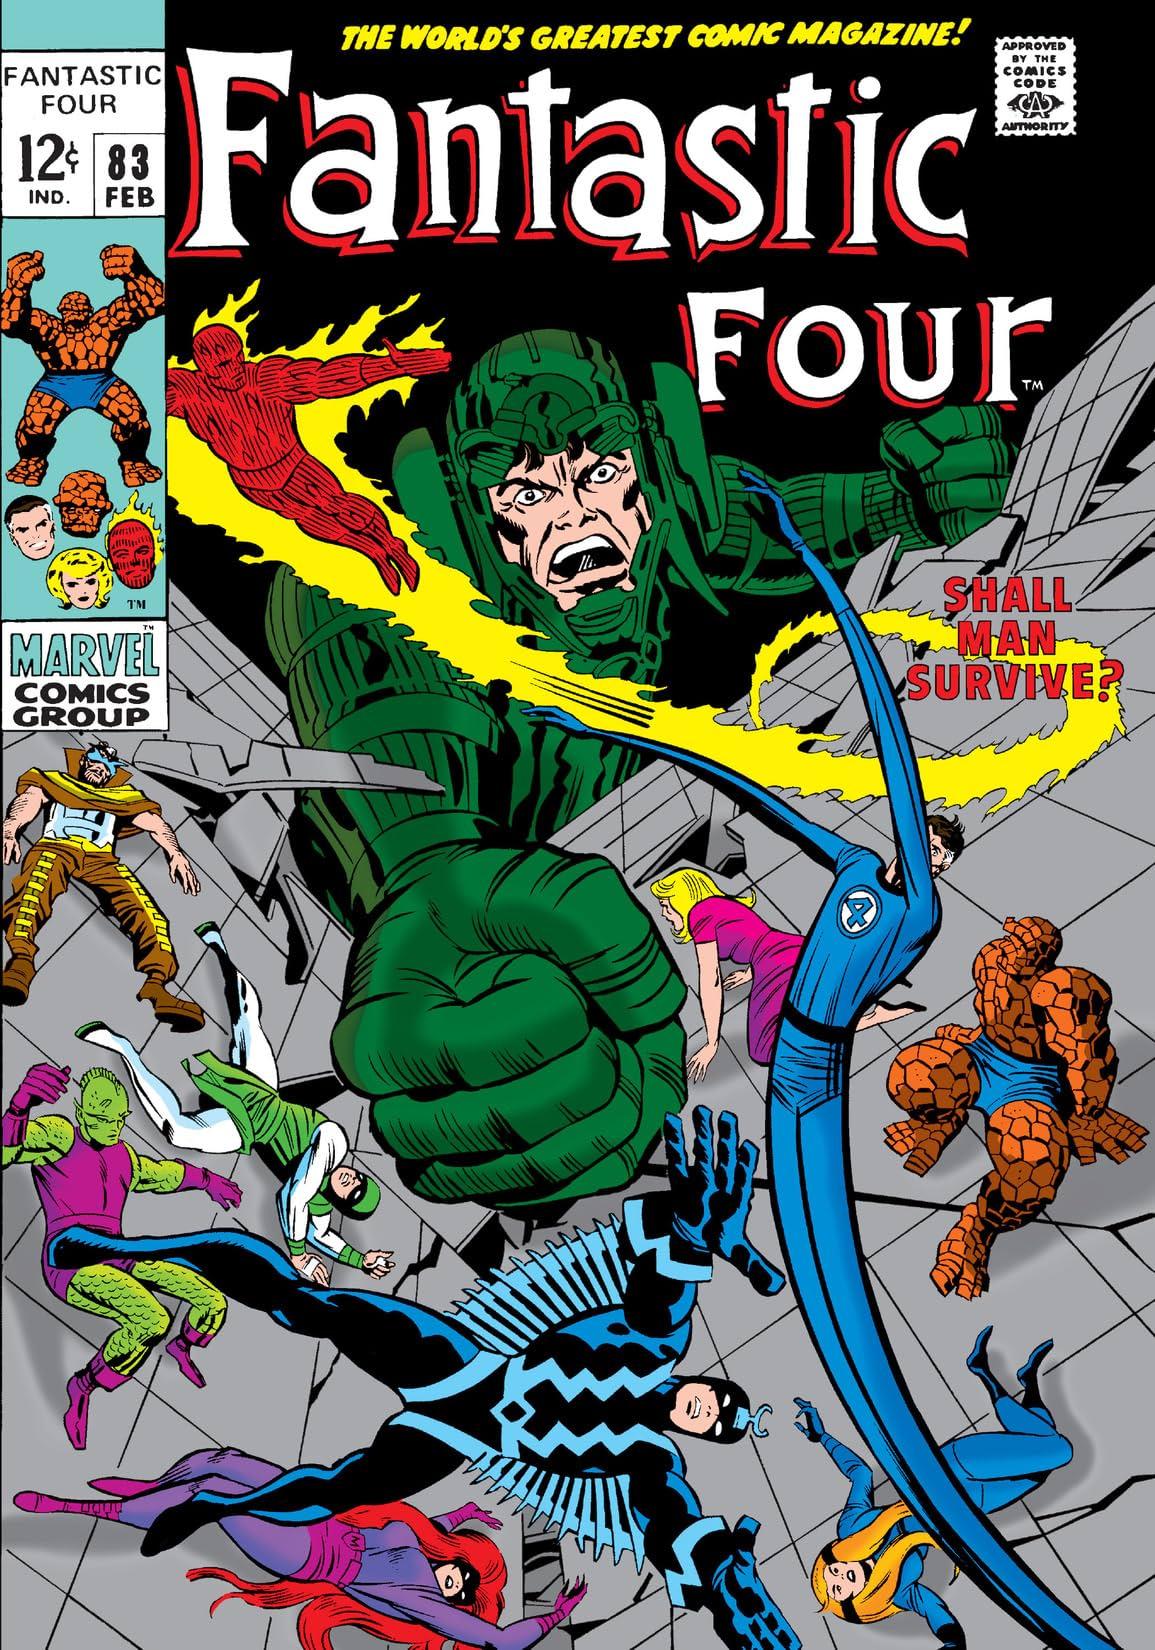 Fantastic Four (1961-1998) #83